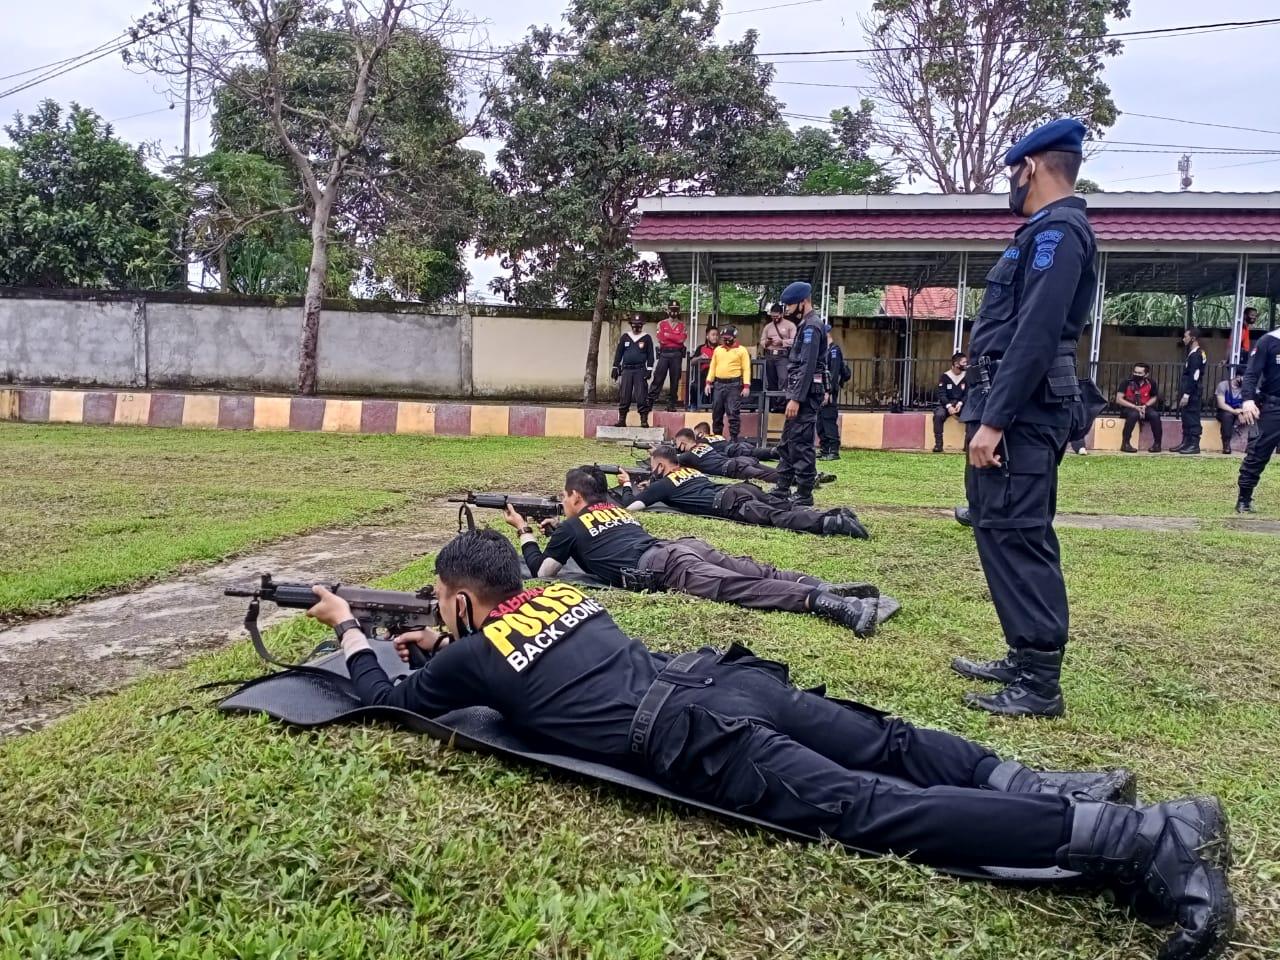 Harkatpuan, Polres RL Gelar Latihan Menembak